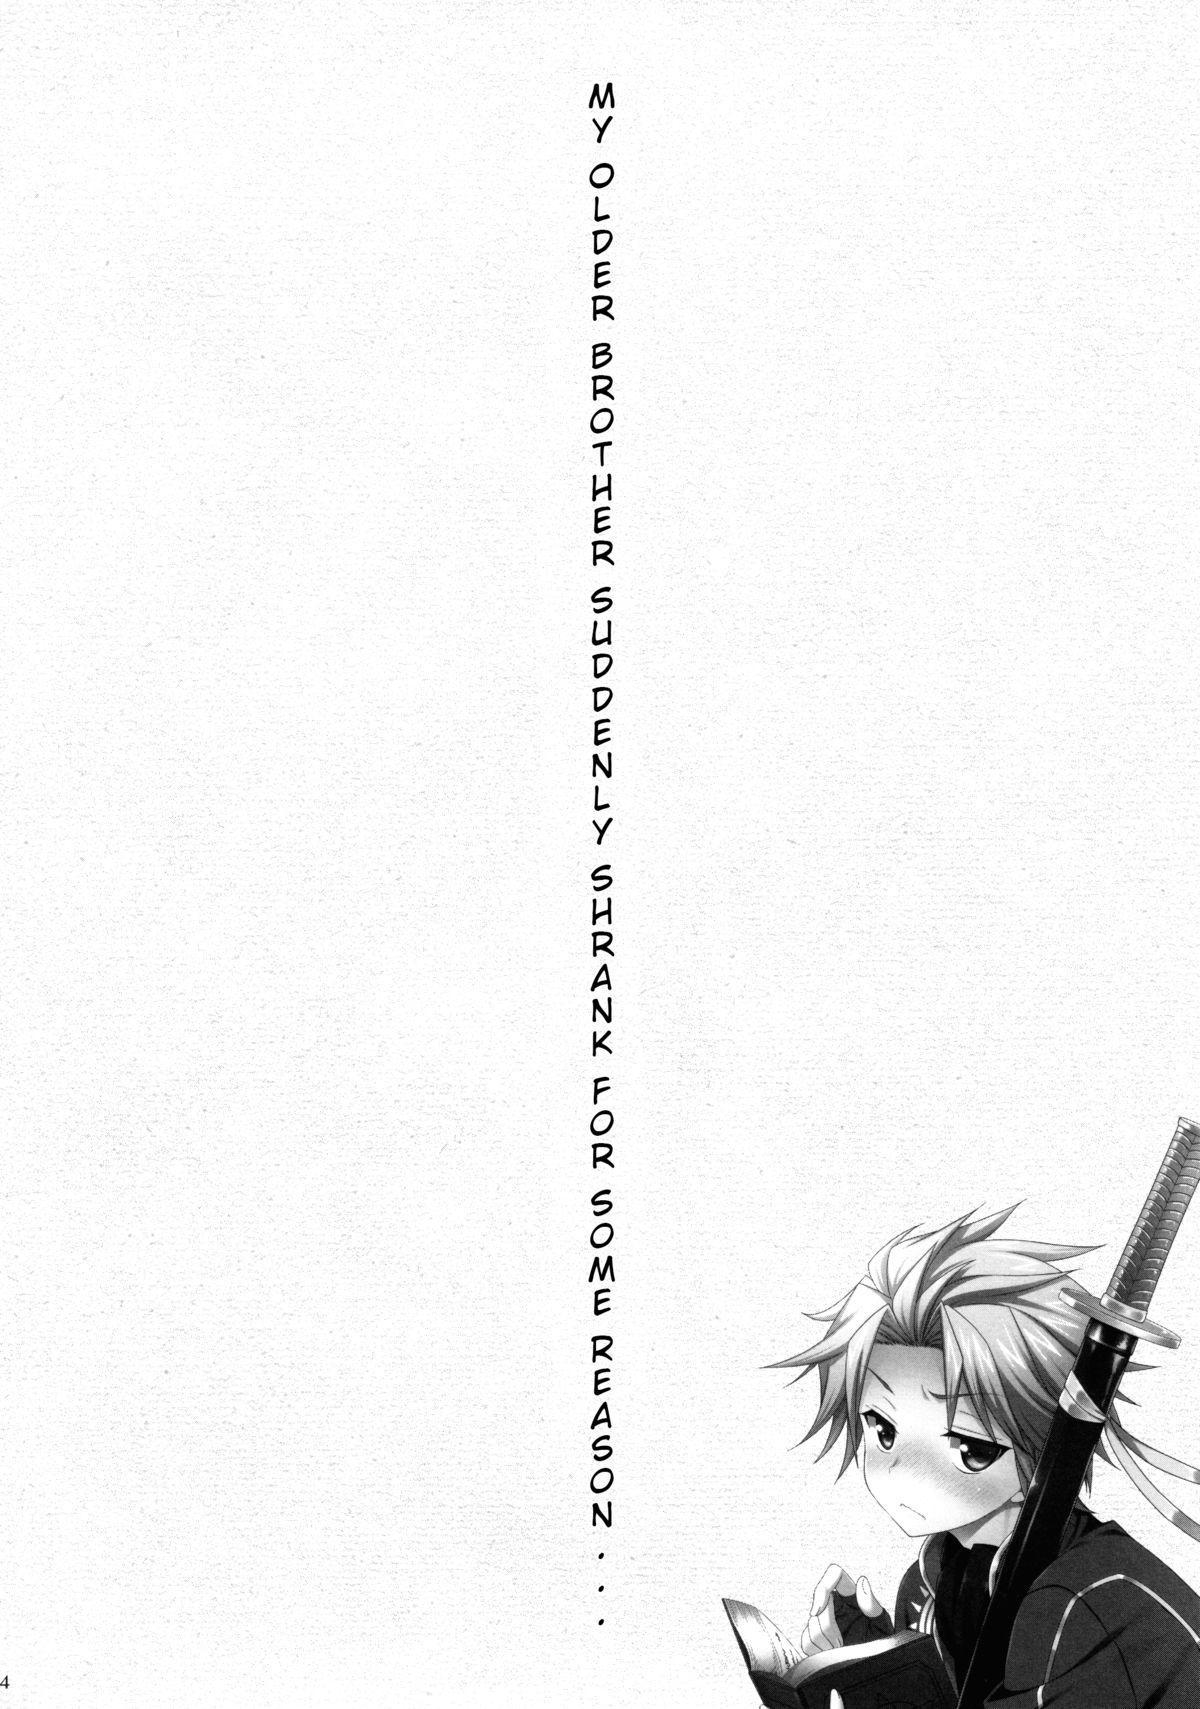 Ore no Aniki ga Naze daka Totsuzen Chicchaku Natte Shimattan daga. | My Older Brother Suddenly Shrank for Some Reason 2